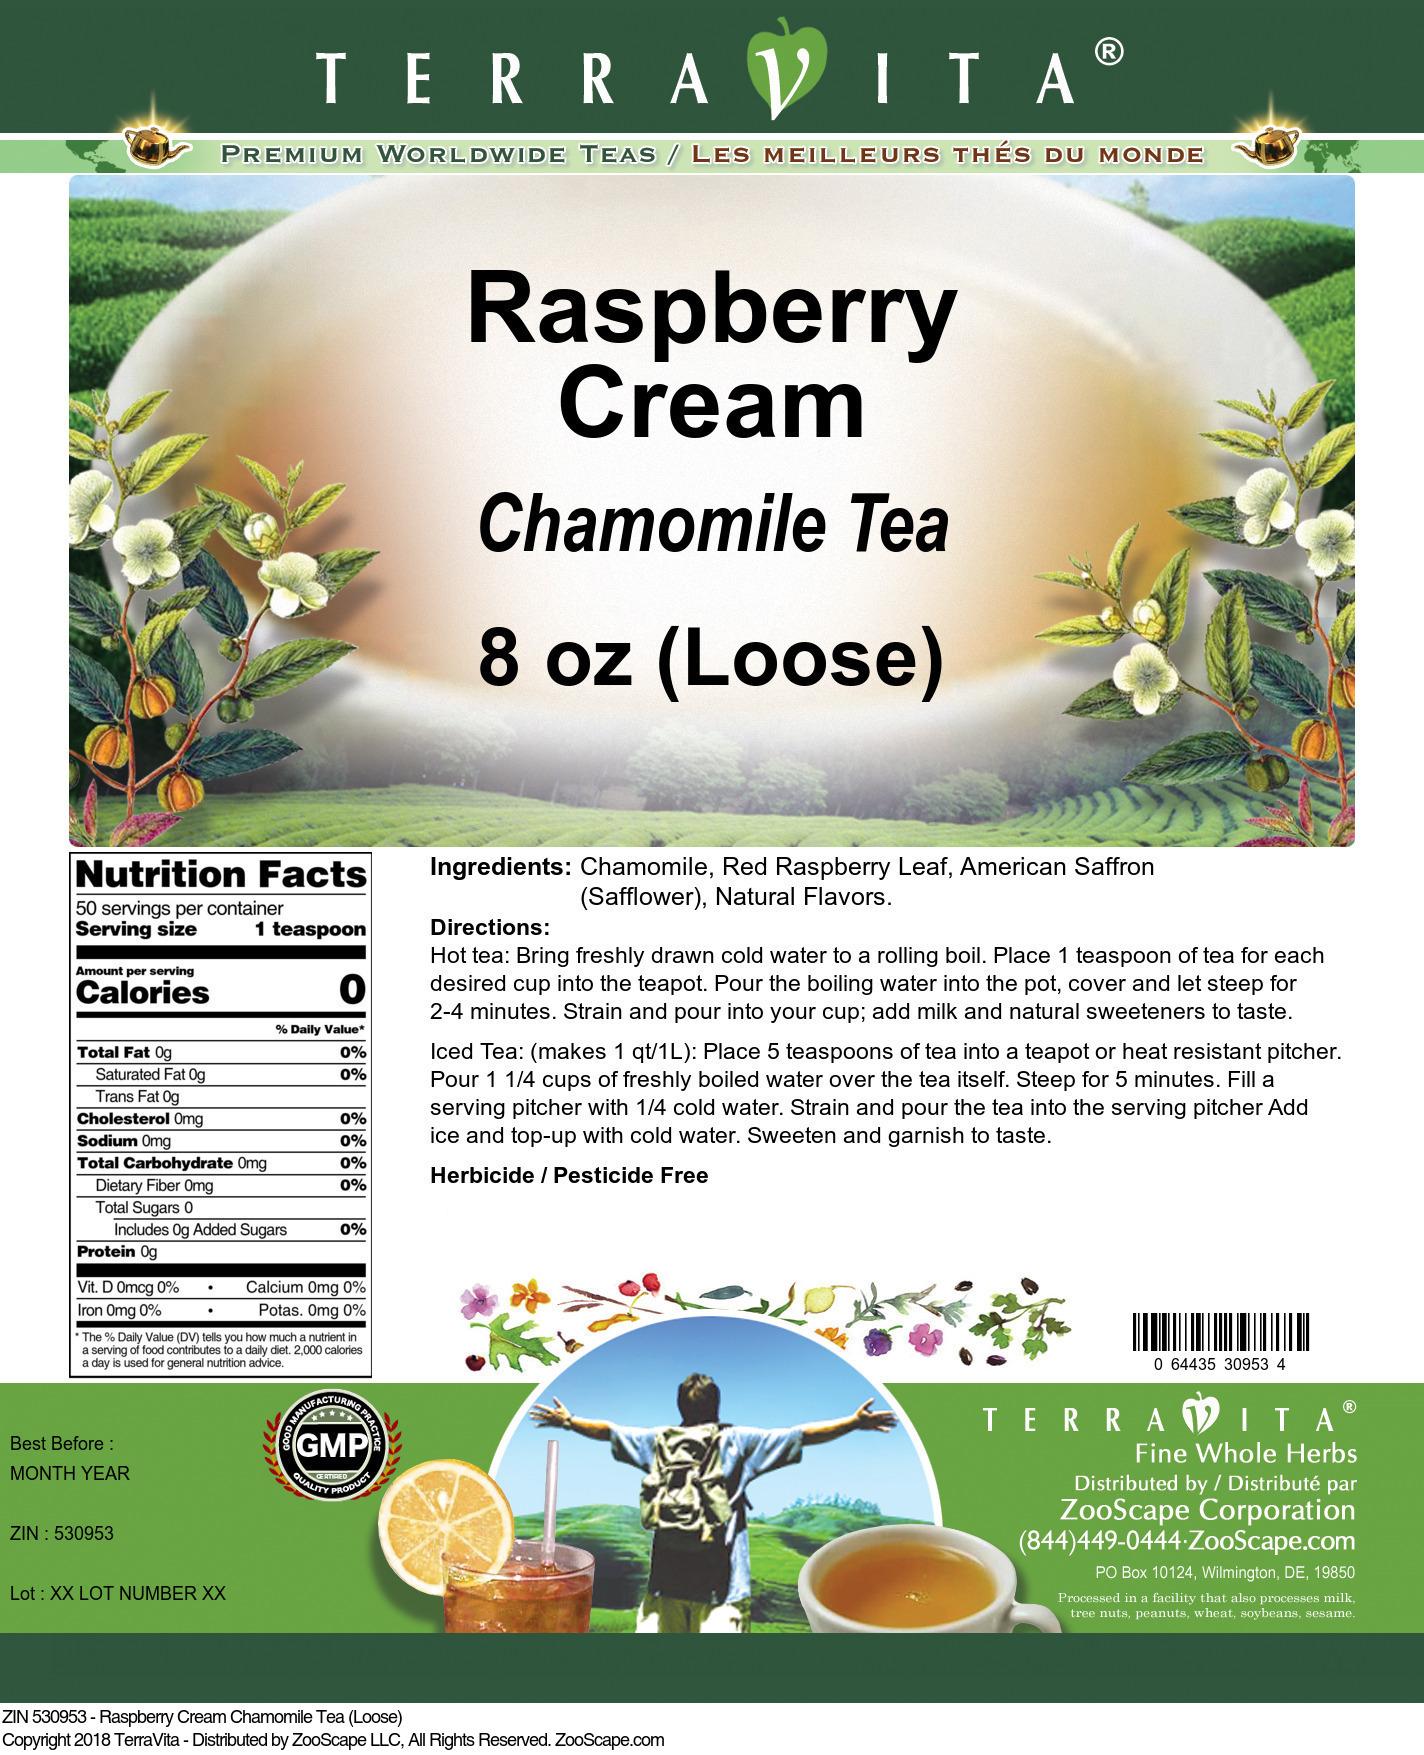 Raspberry Cream Chamomile Tea (Loose)